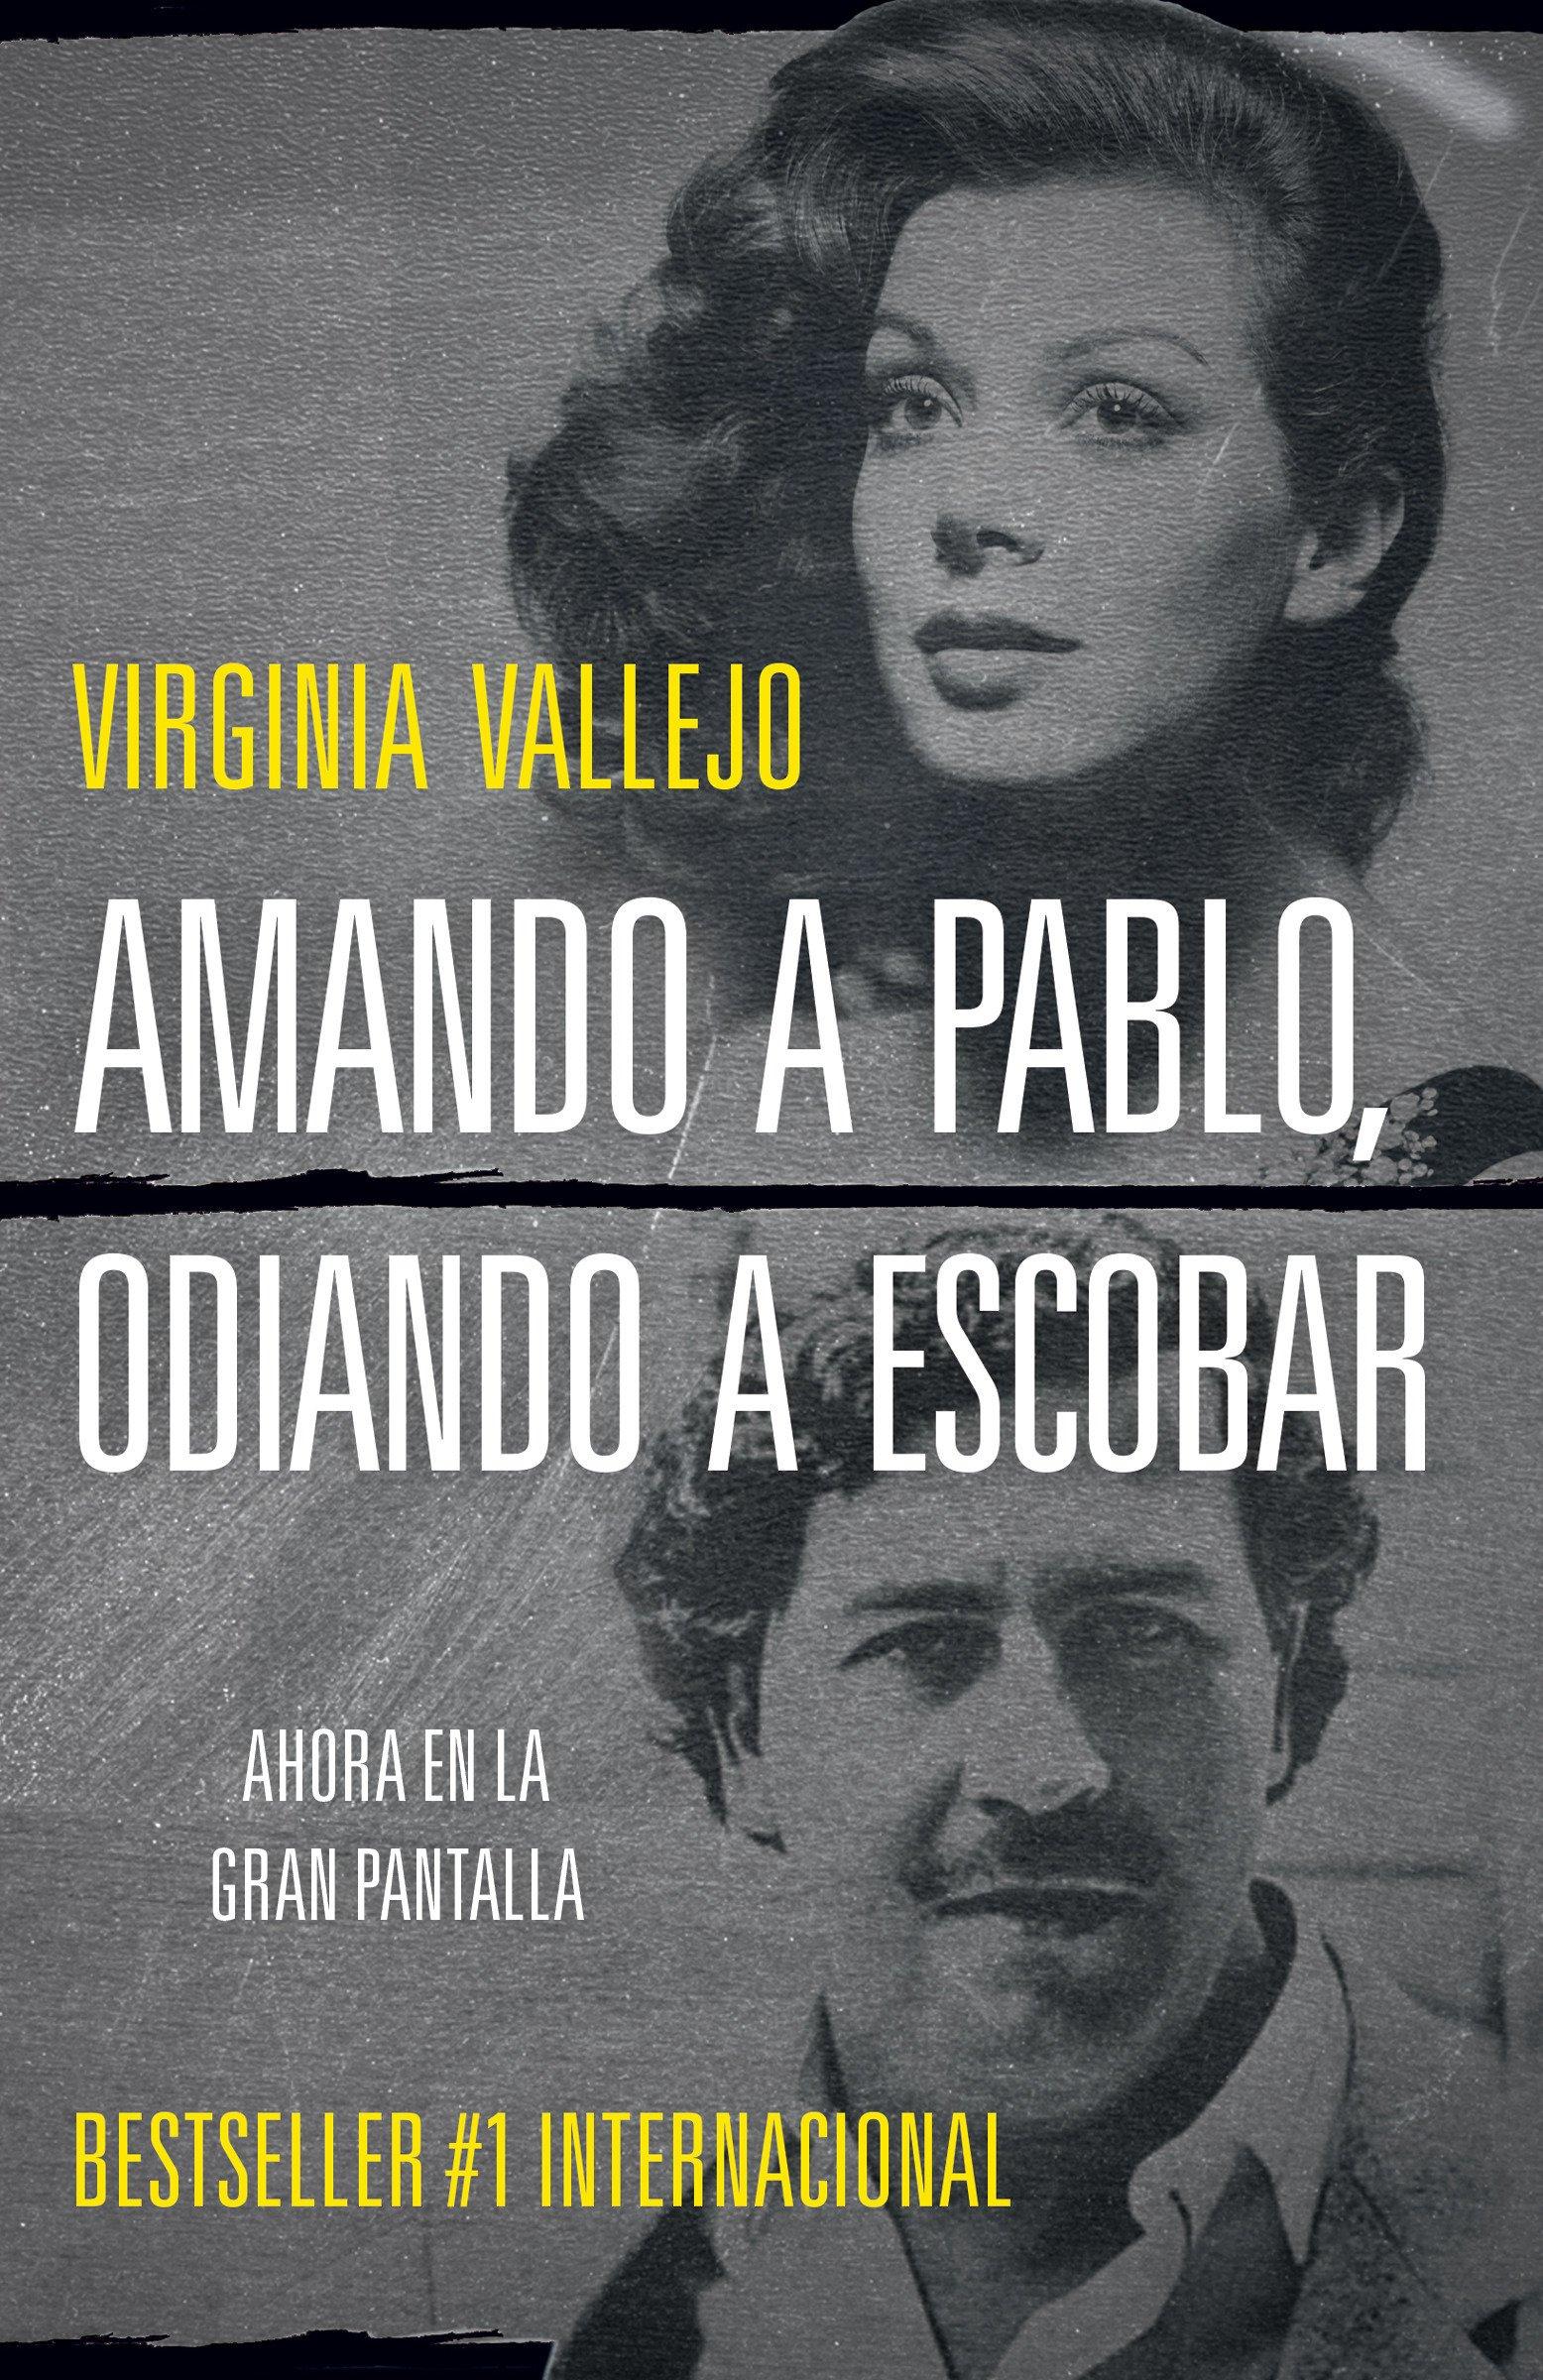 Amando a Pablo, odiando a Escobar (Spanish Edition): Virginia Vallejo: 9780525433422: Amazon.com: Books